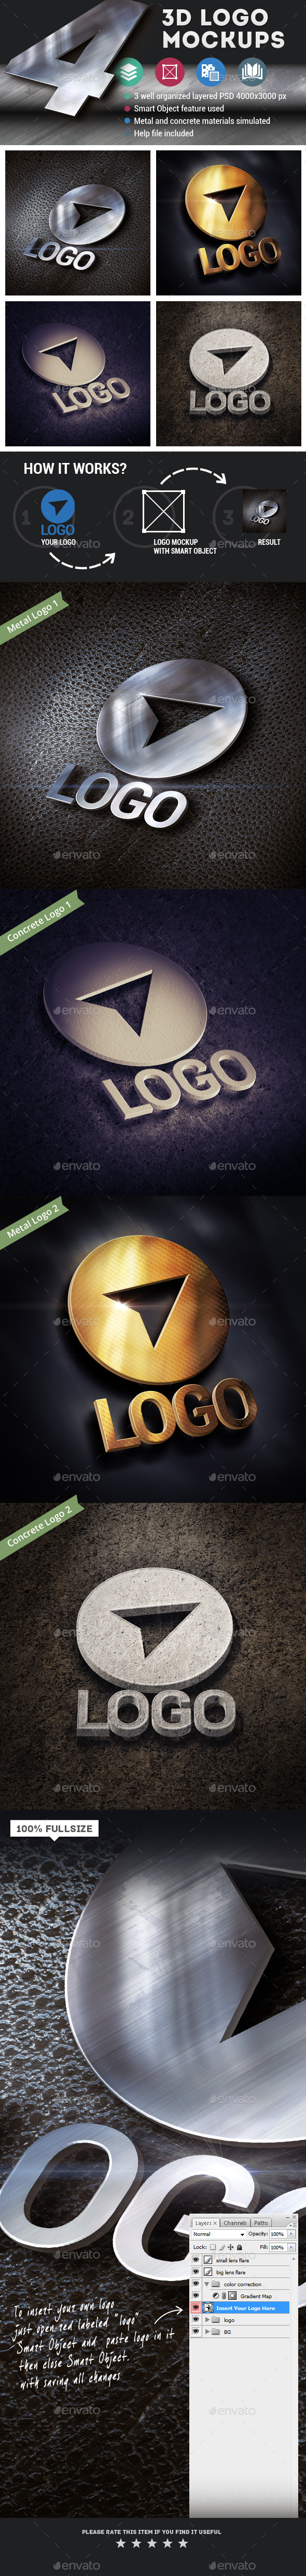 4 3d Logo Mockups - Logo Product Mock-Ups